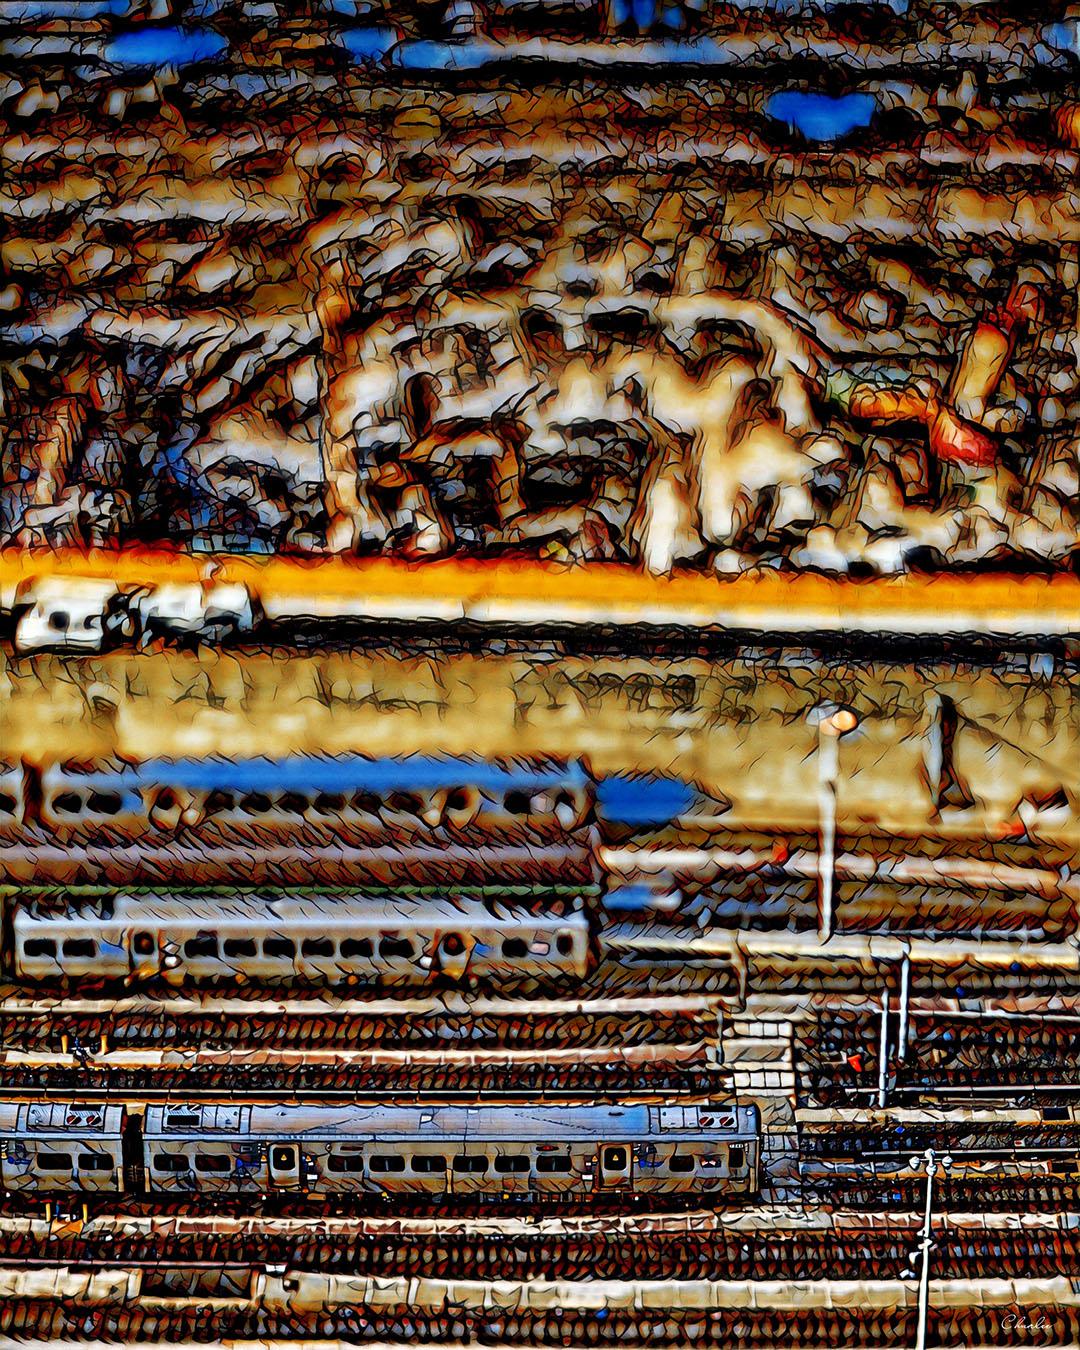 Hudson Yards by Charles Maring